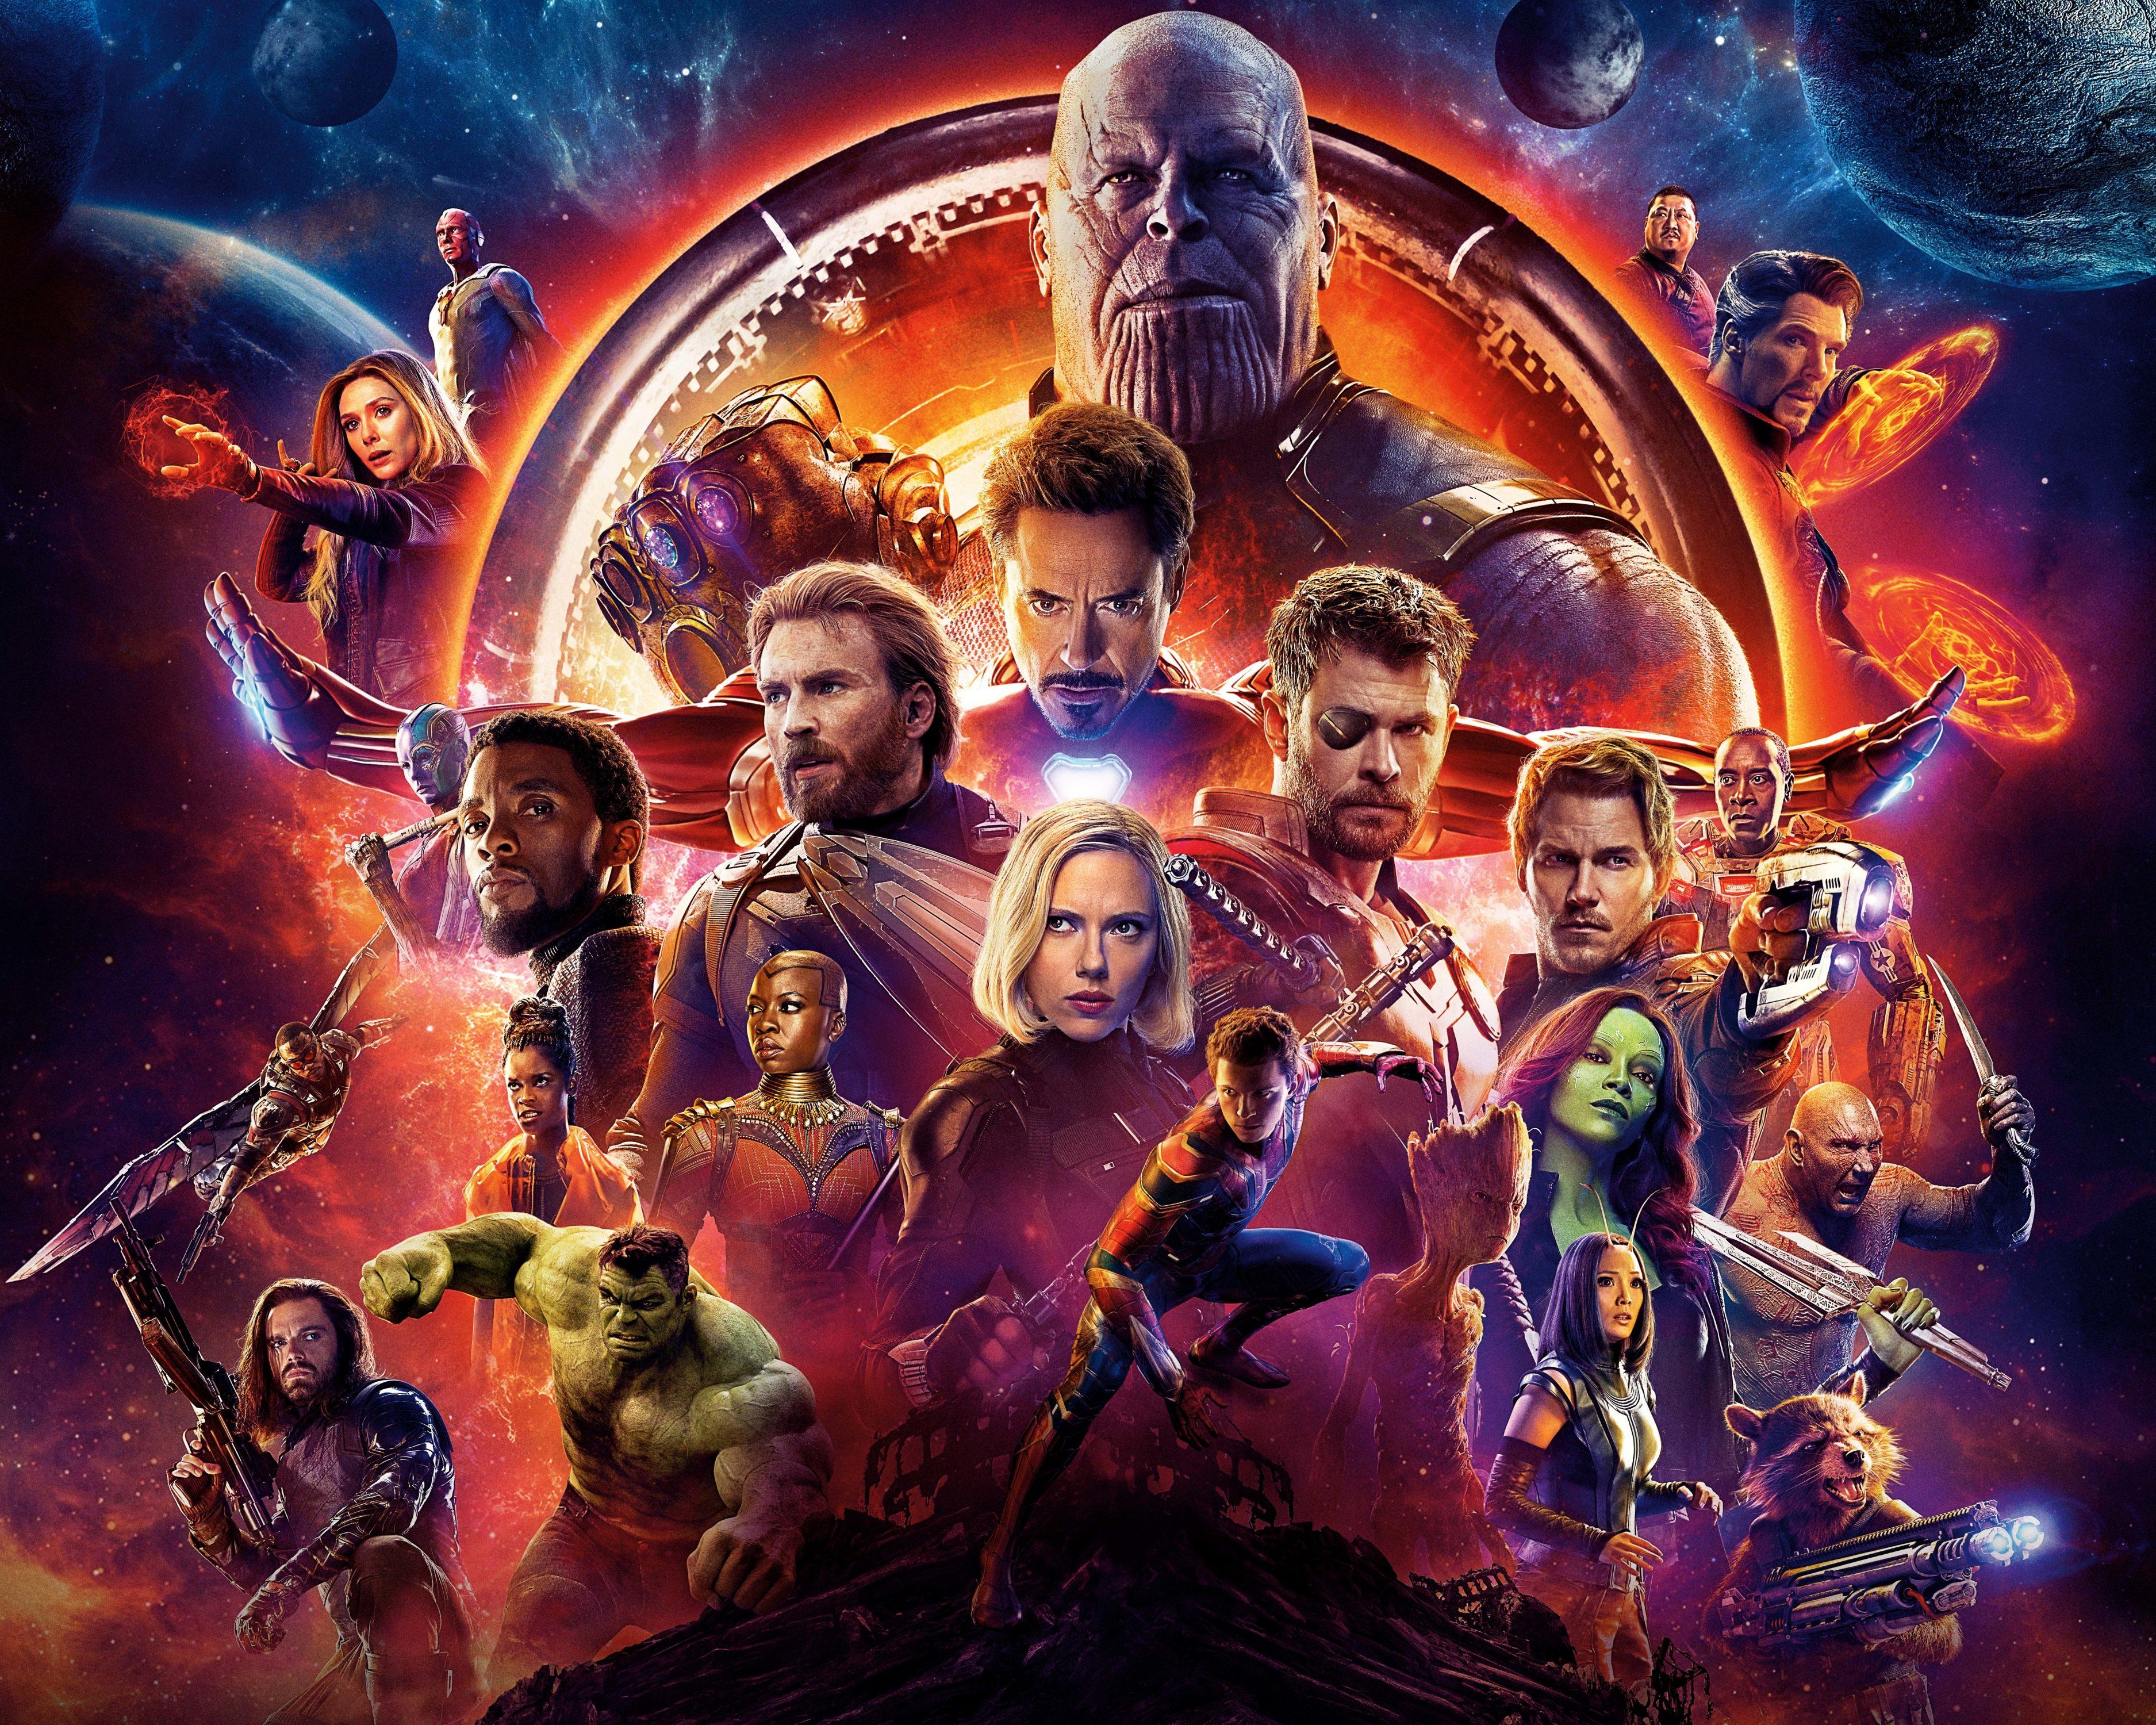 Avengers: Infinity War (2018) 8K UHD Wallpaper HD Wallpaper